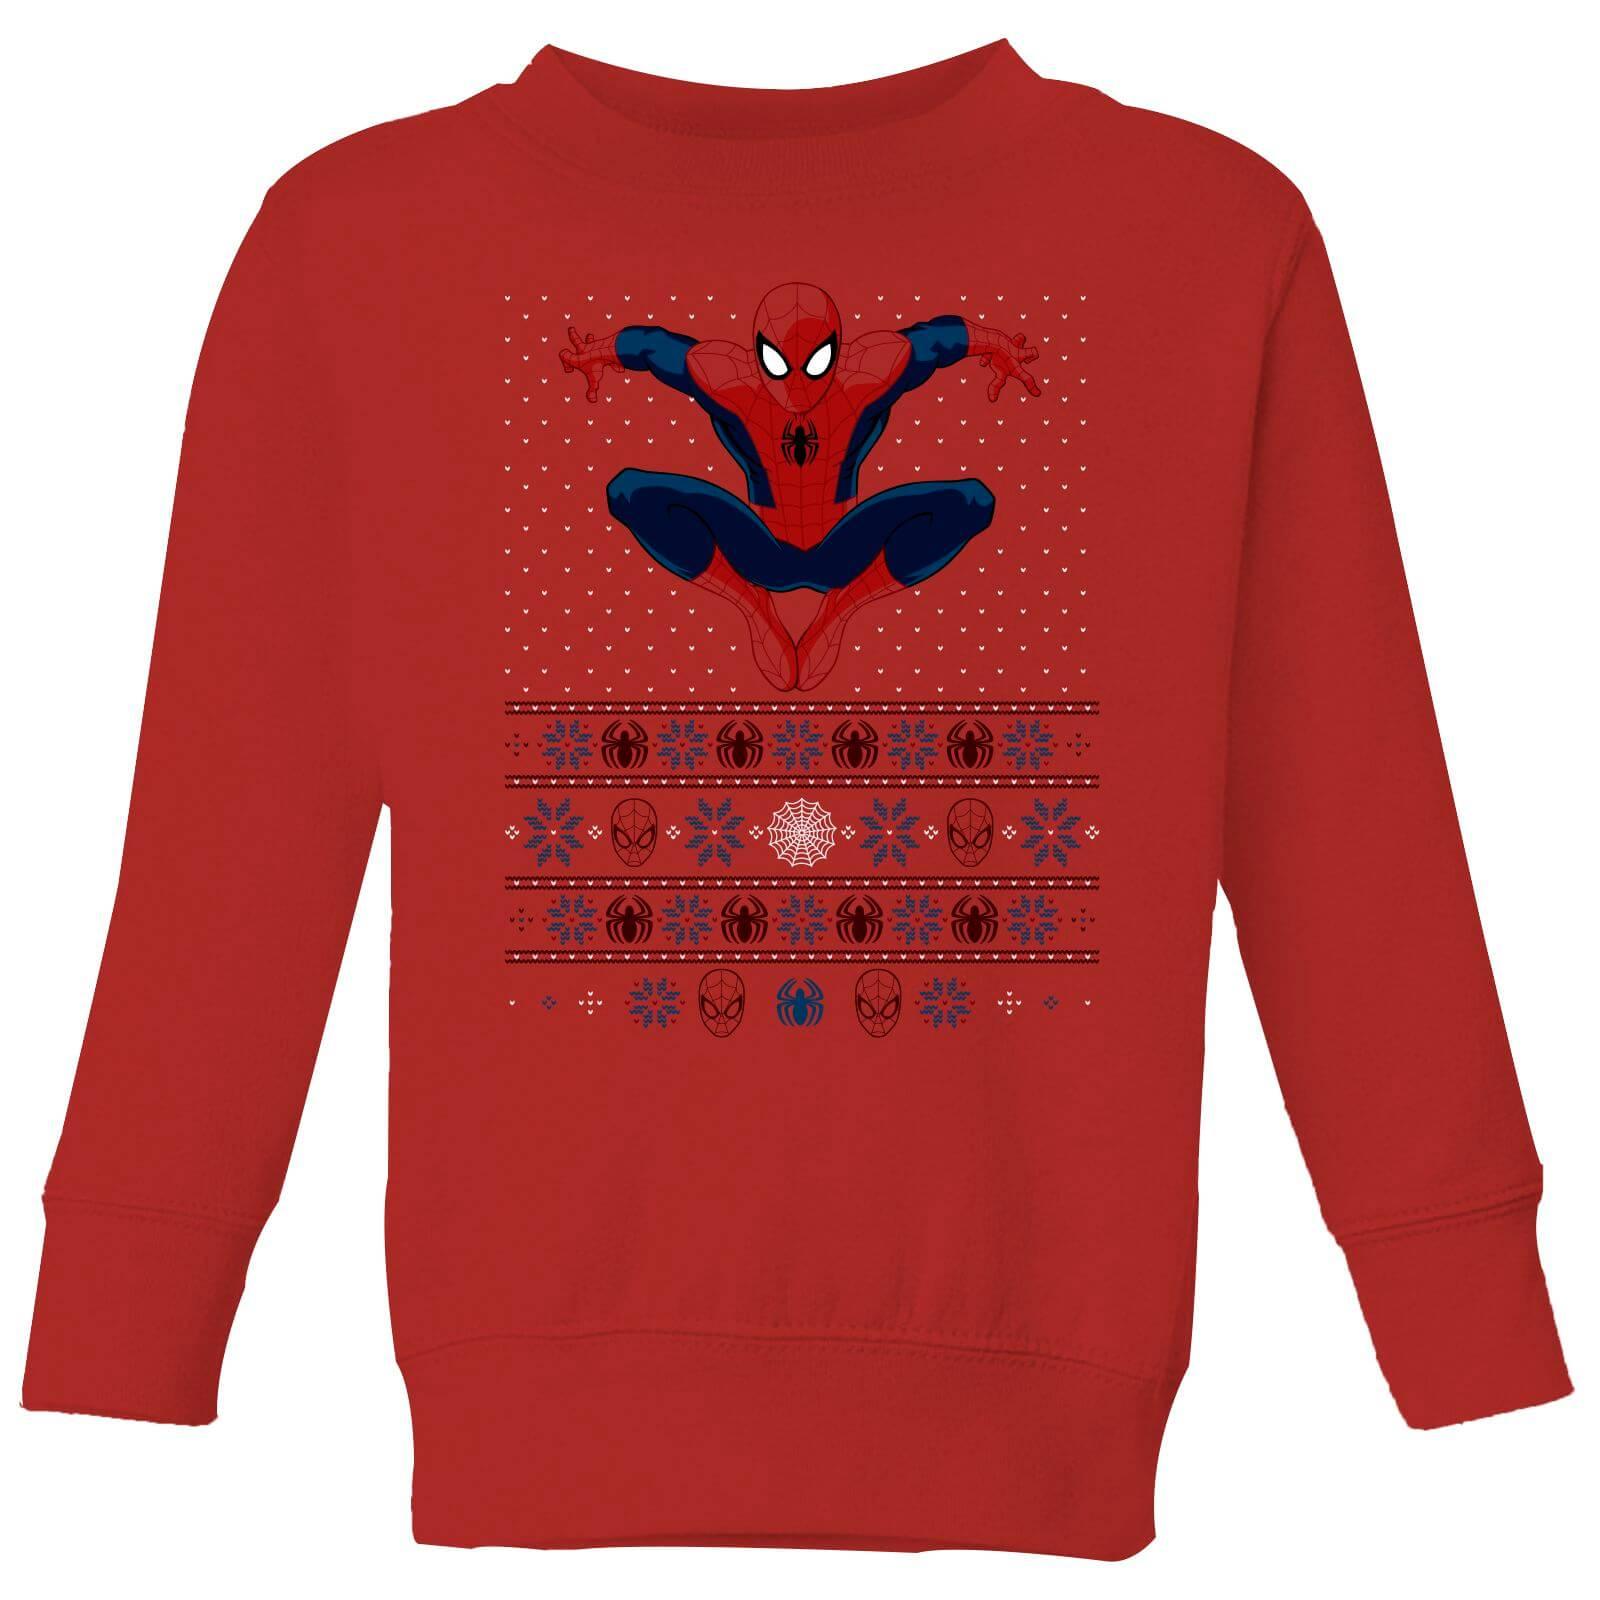 Marvel Avengers Spider Man Kids Christmas Sweatshirt   Red   5 6 Years   Red